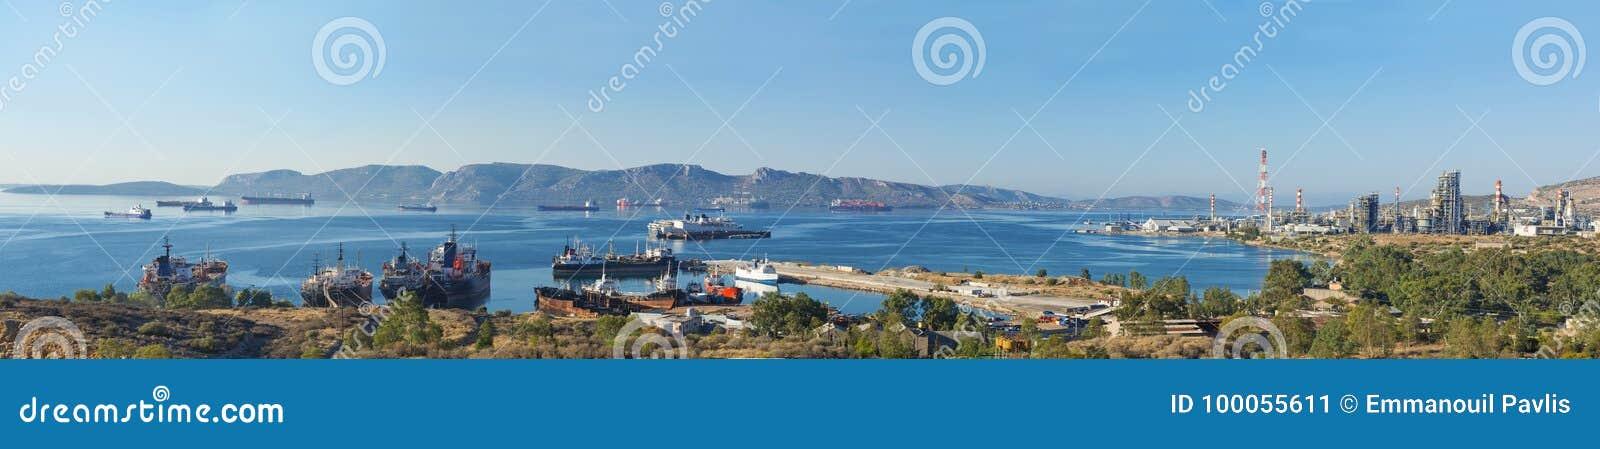 Bahía de Eleusis, Atica - Grecia